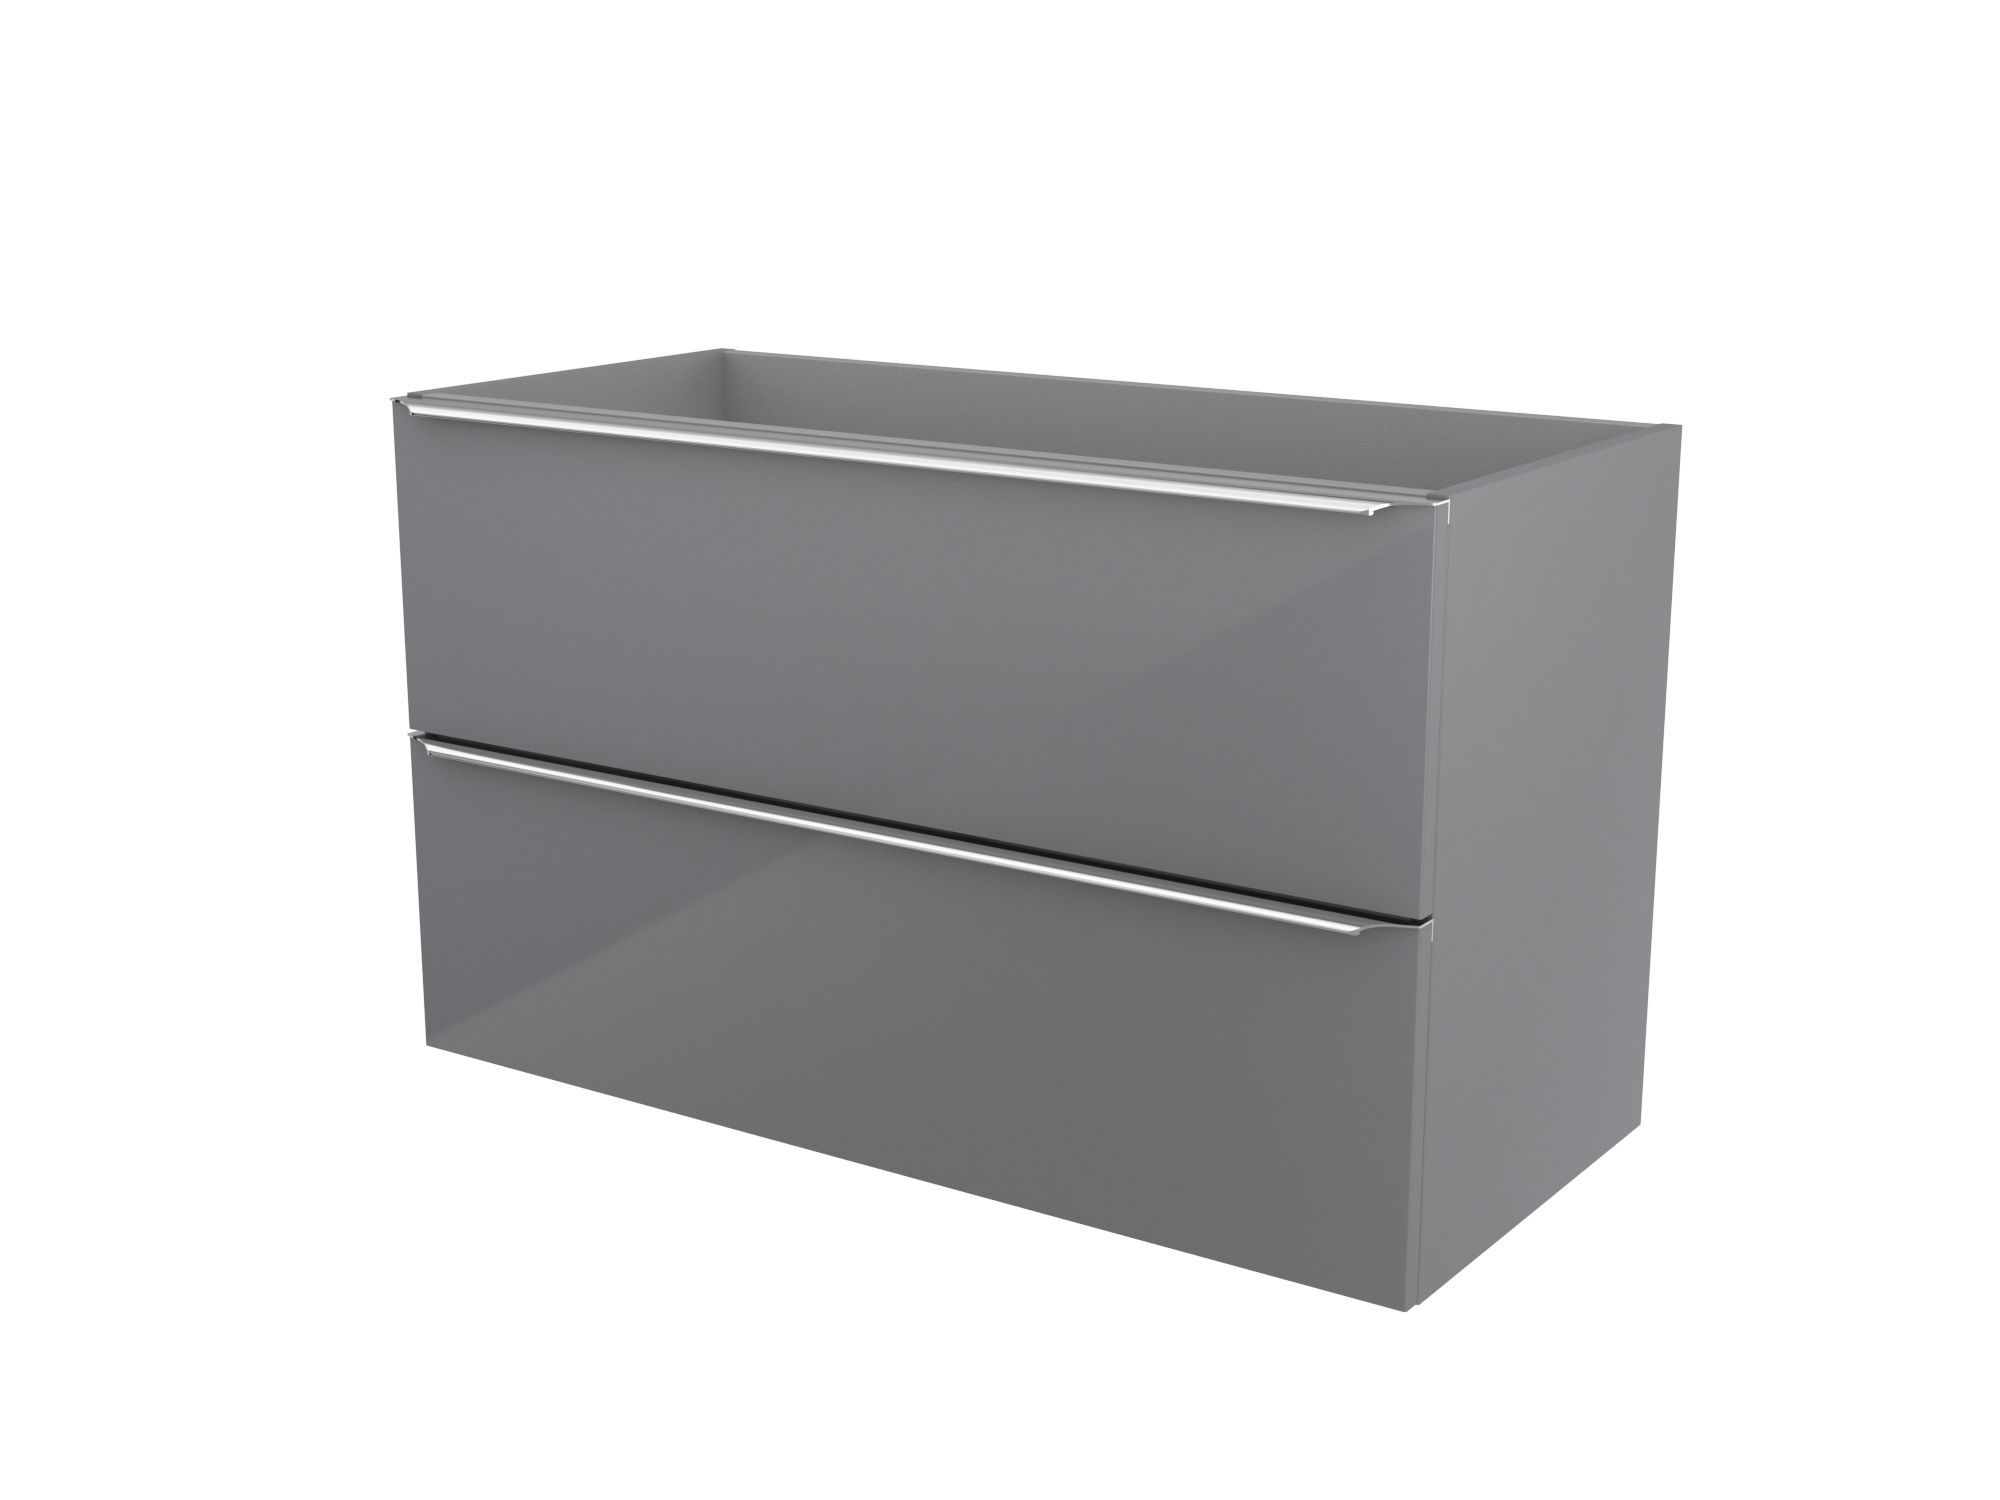 cooke lewis imandra gloss grey vanity basin unit w 1000mm